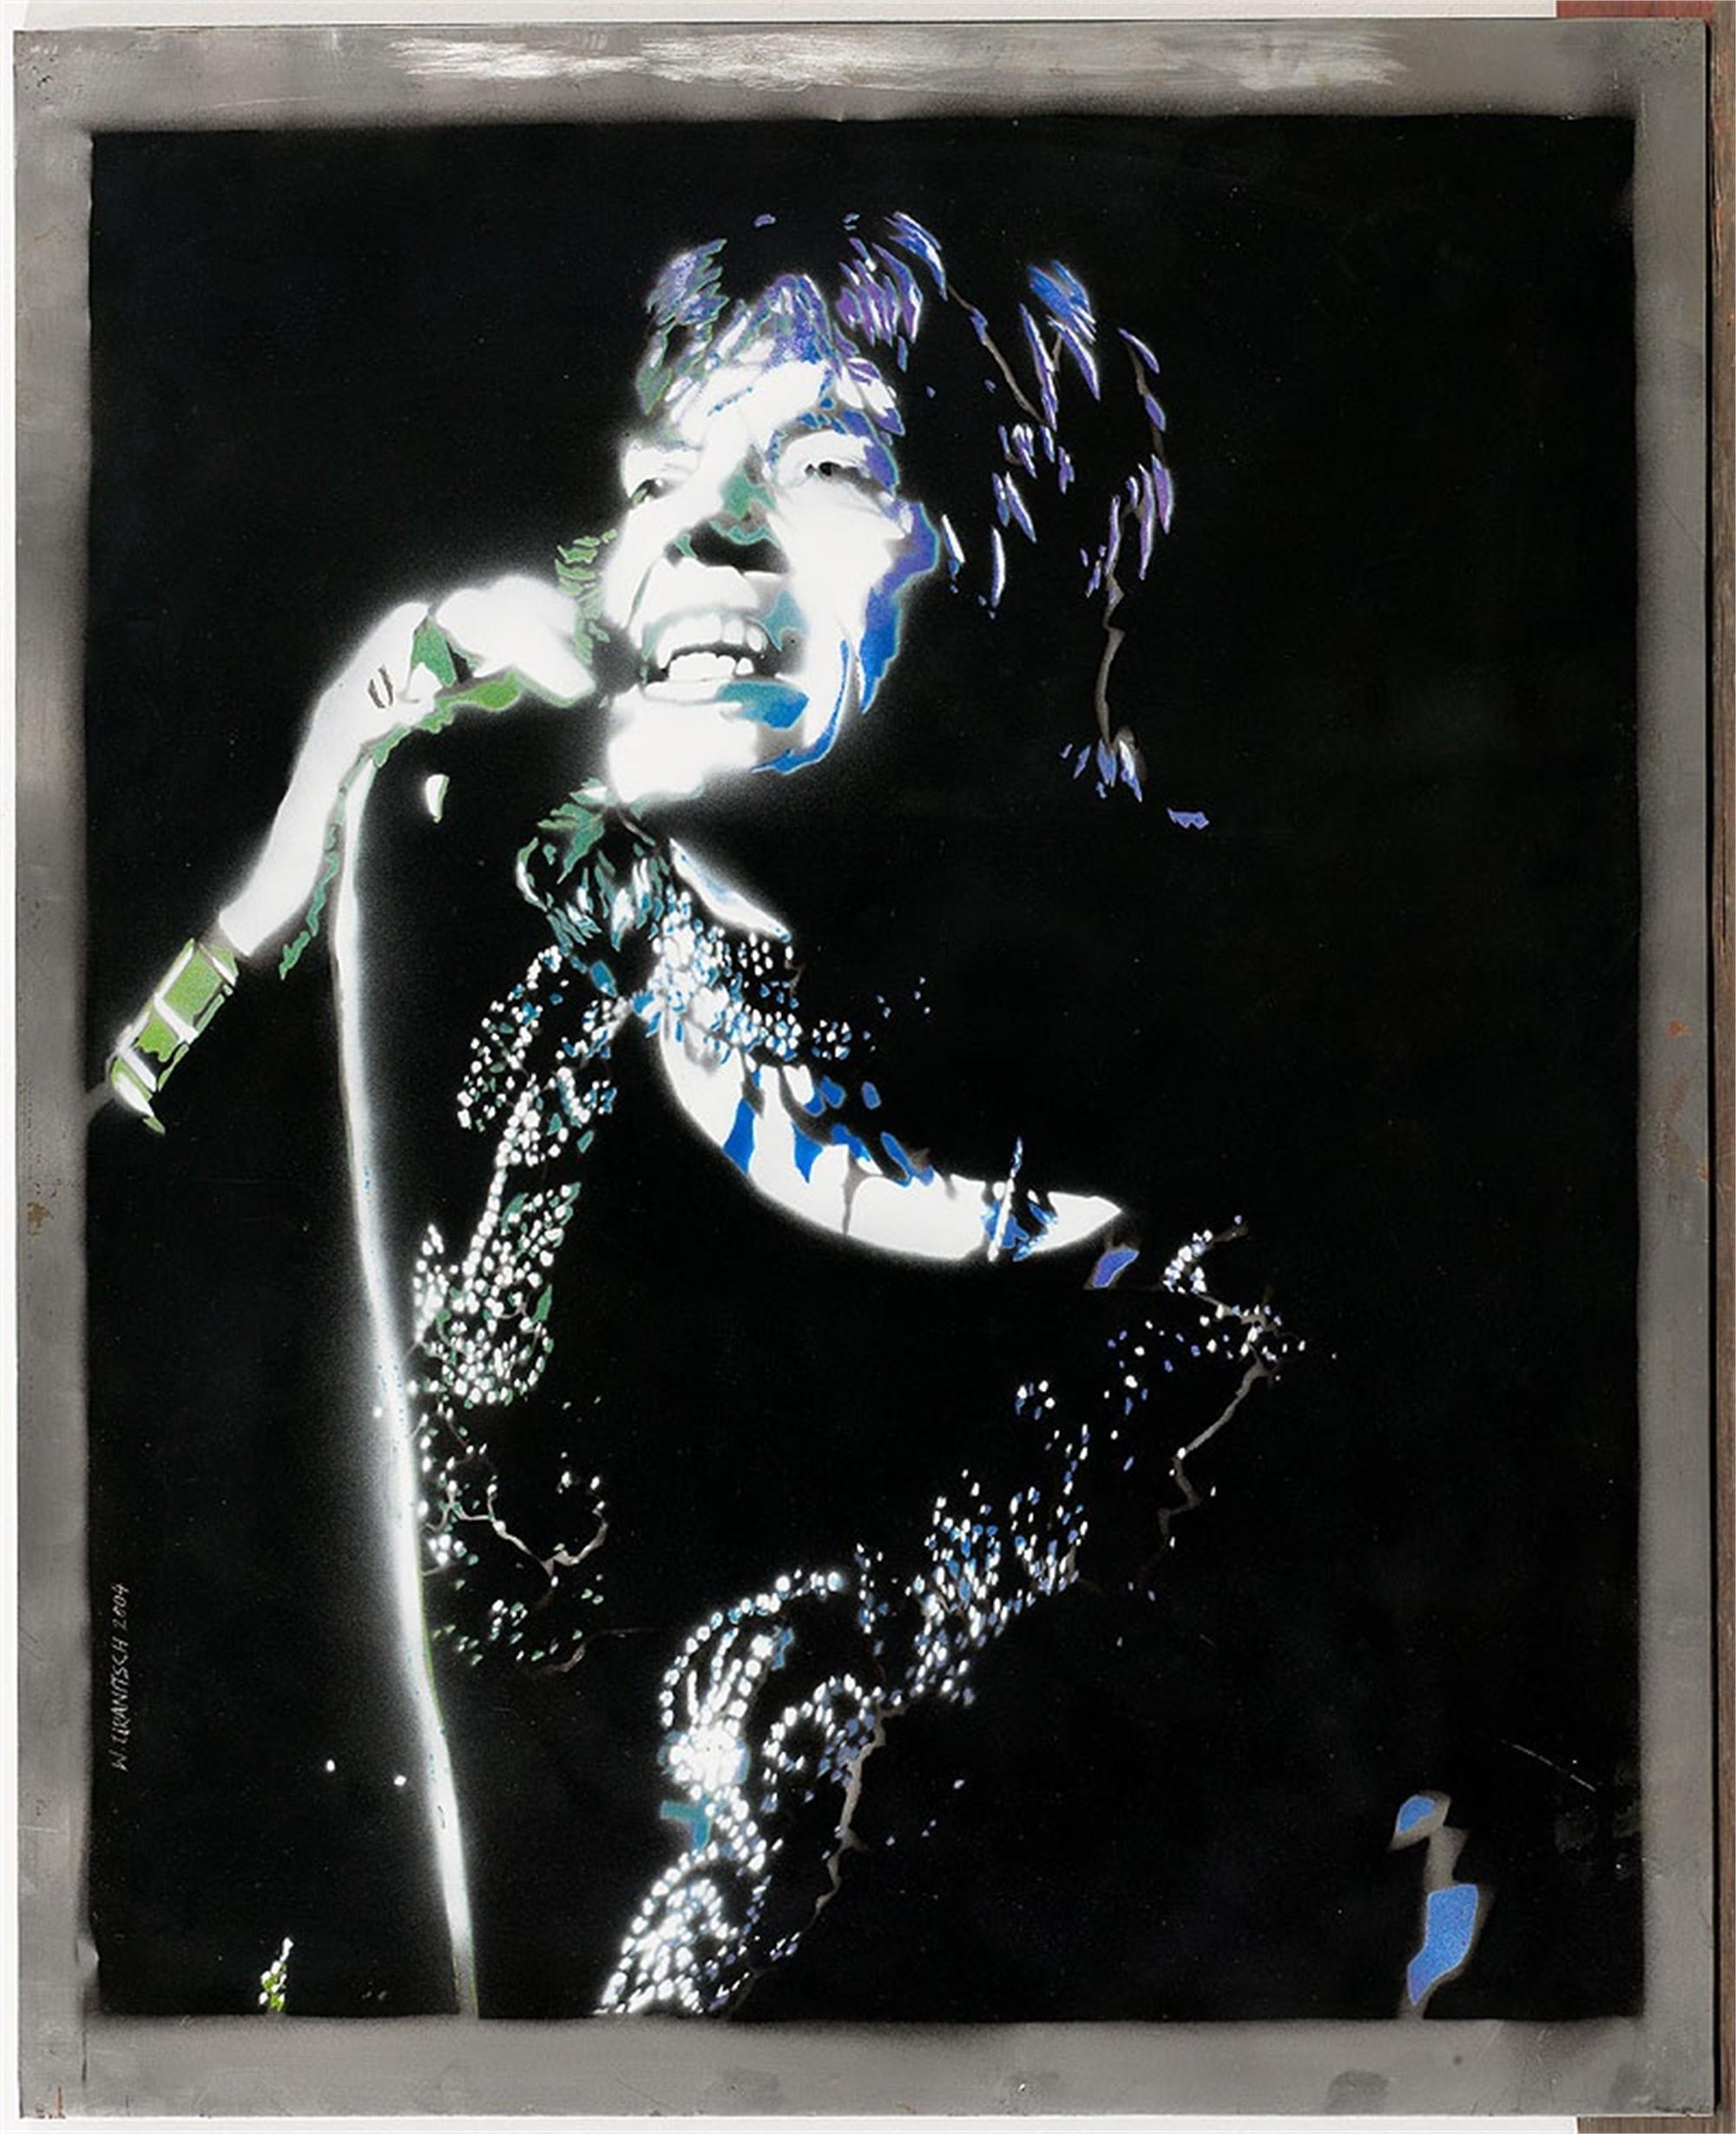 Mick Jagger by Wolfgang Uranitsch